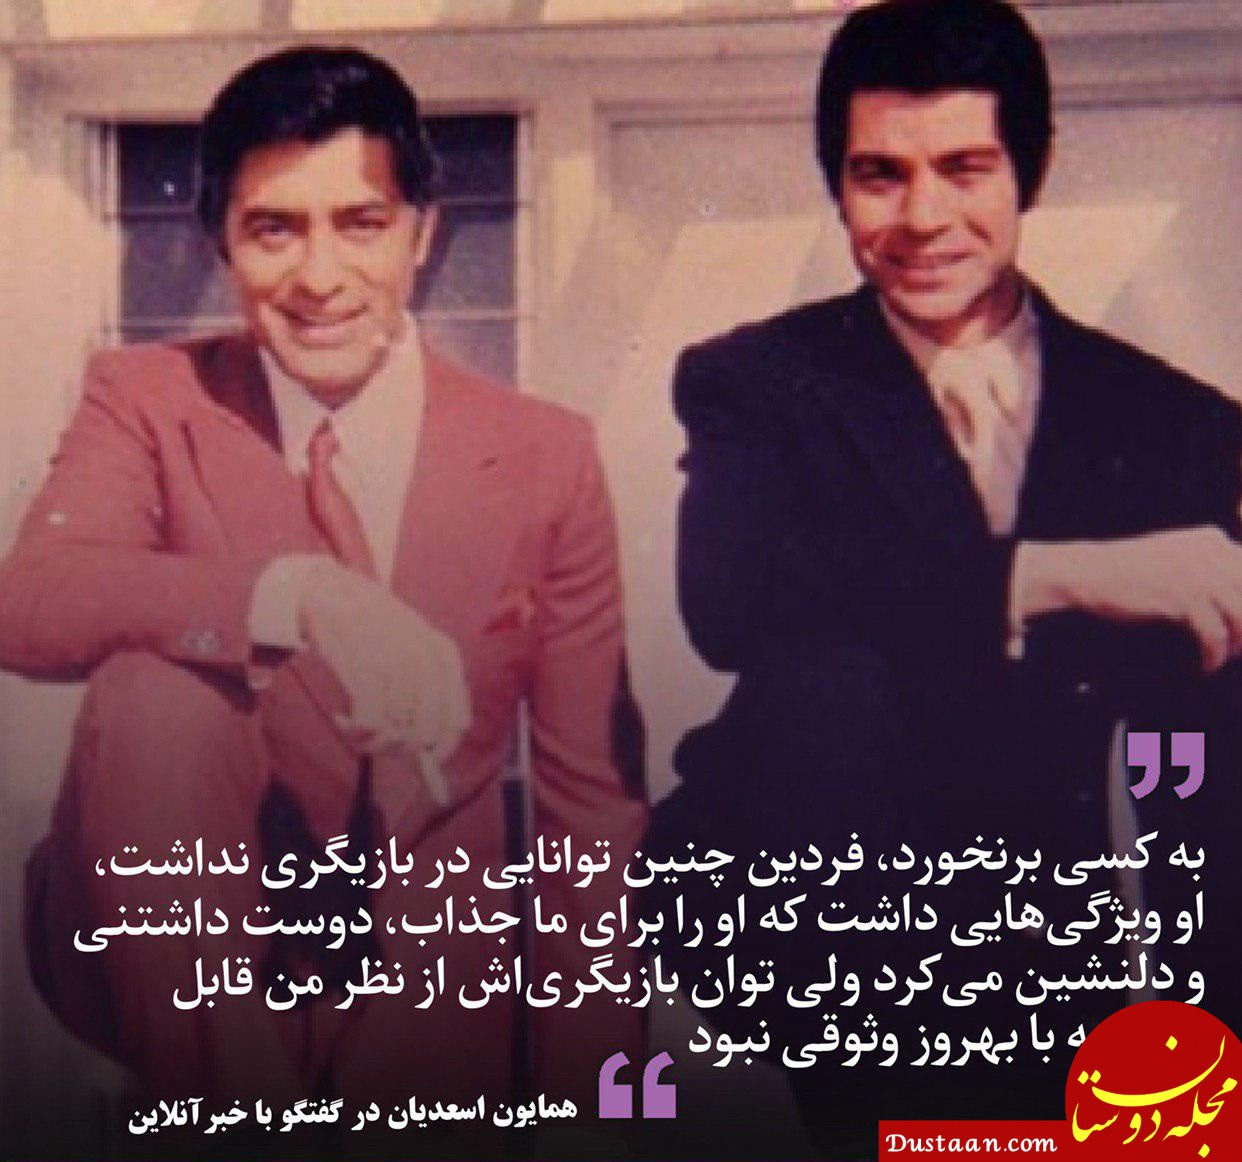 www.dustaan.com توان بازیگری فردین قابل مقایسه با بهروز وثوقی نبود